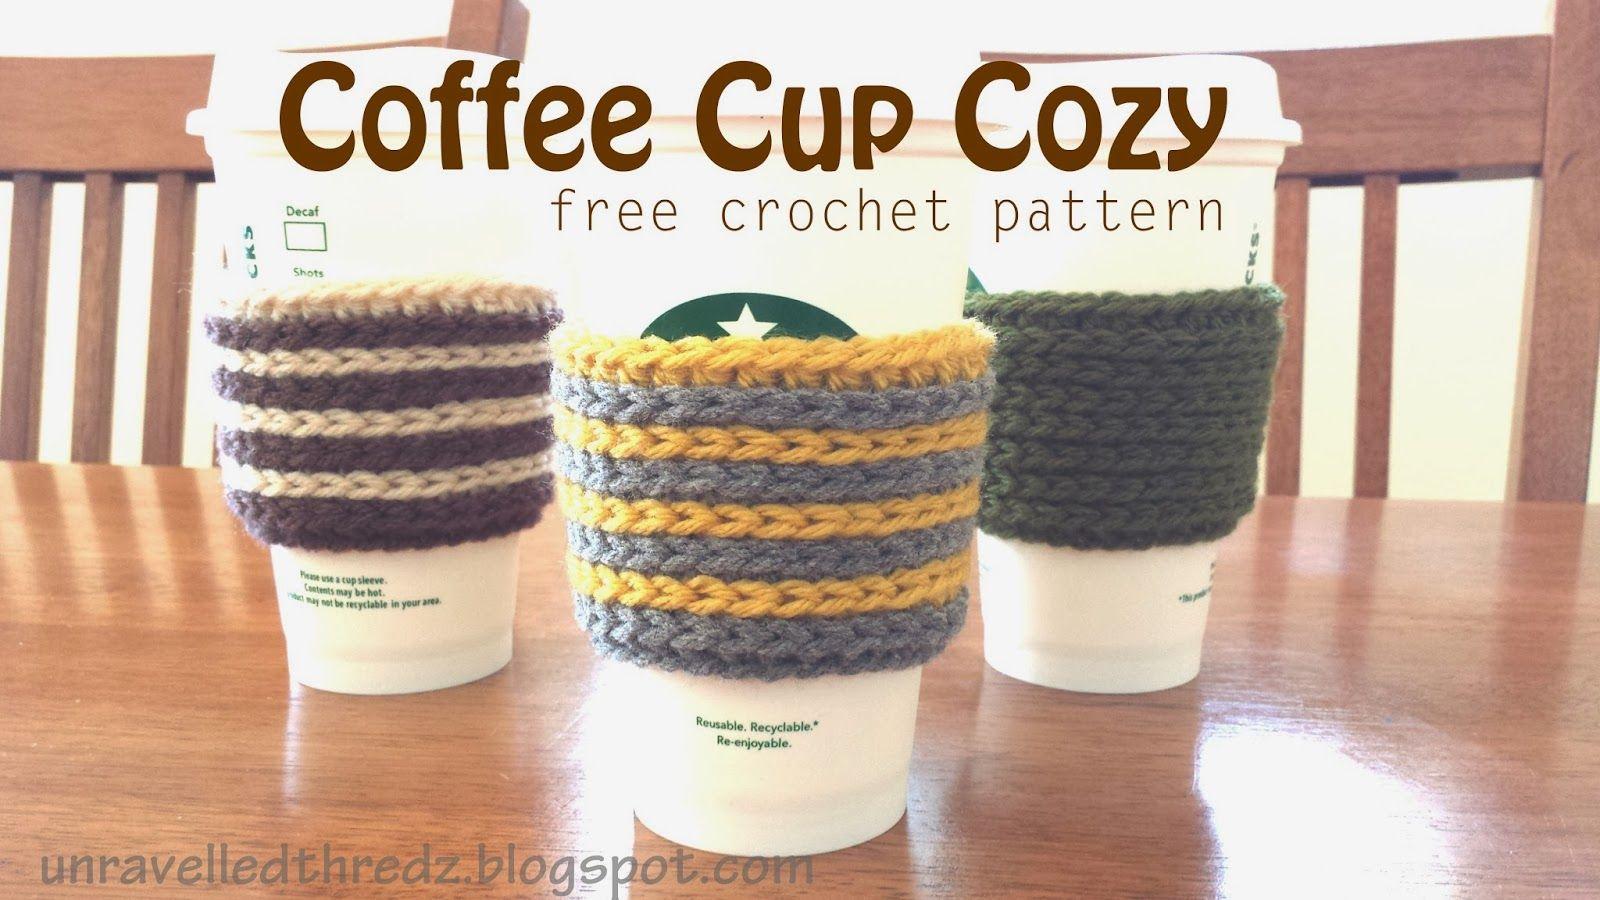 Unravelled Thredz: Coffee Cup Cozy- Free Crochet Pattern | crochet ...